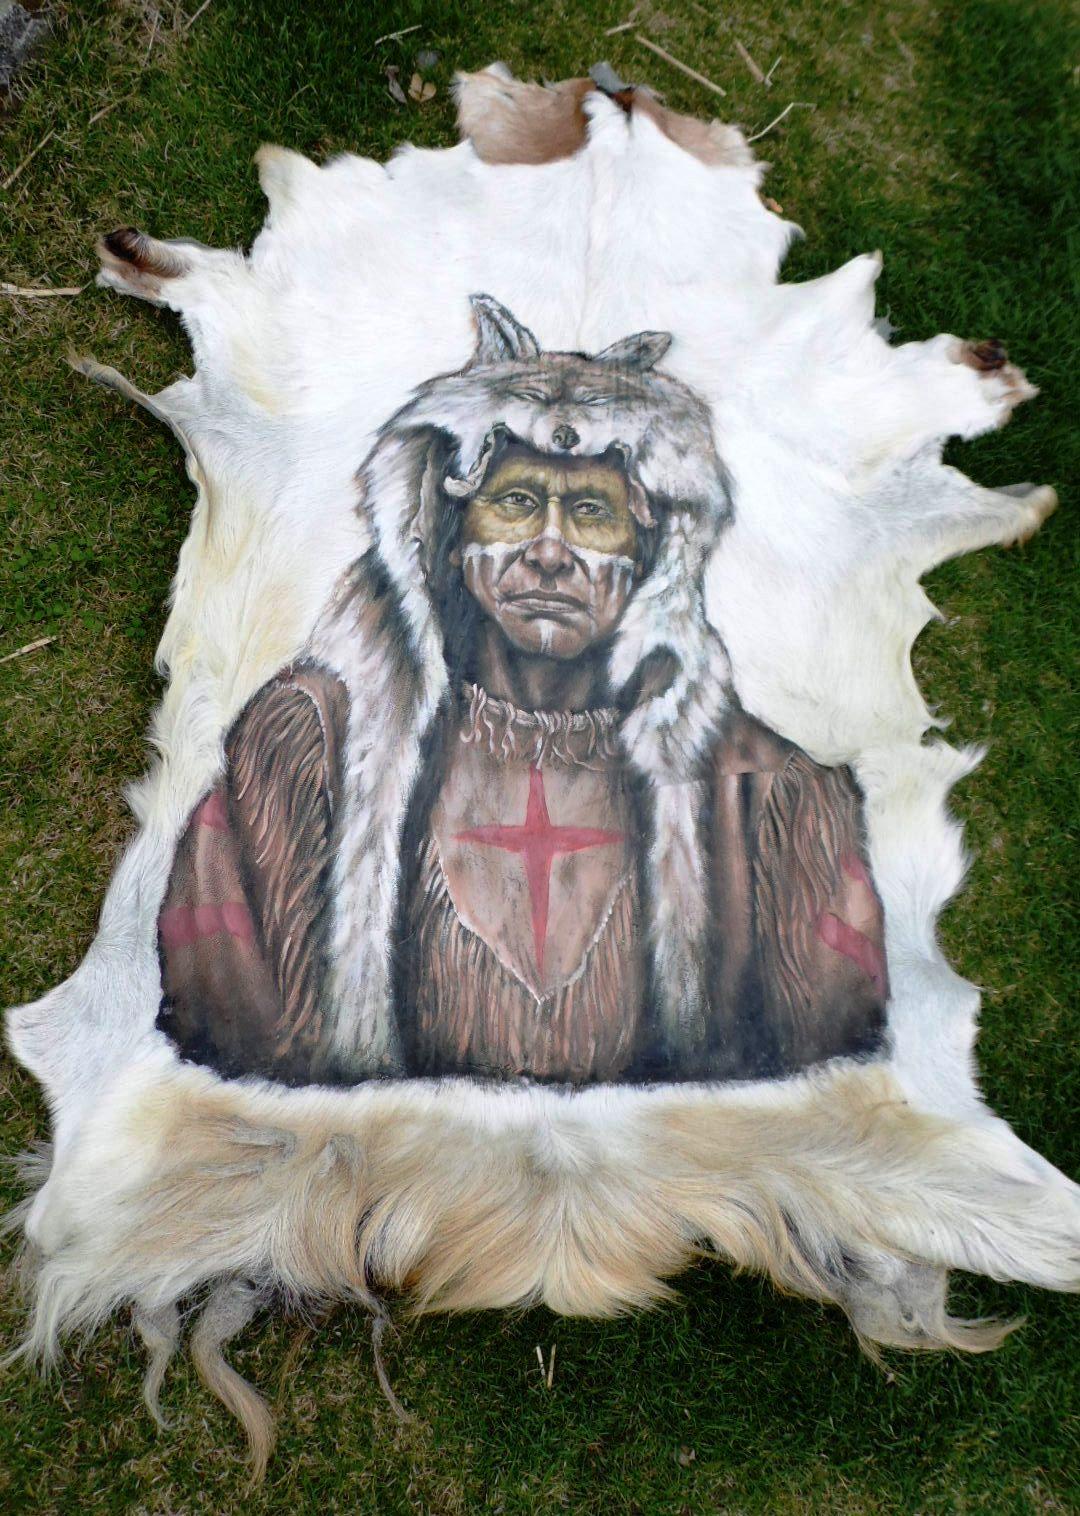 Blickfang Tierfell Teppich Referenz Von Ziegenfell * Goatskin Leather * Ziege *